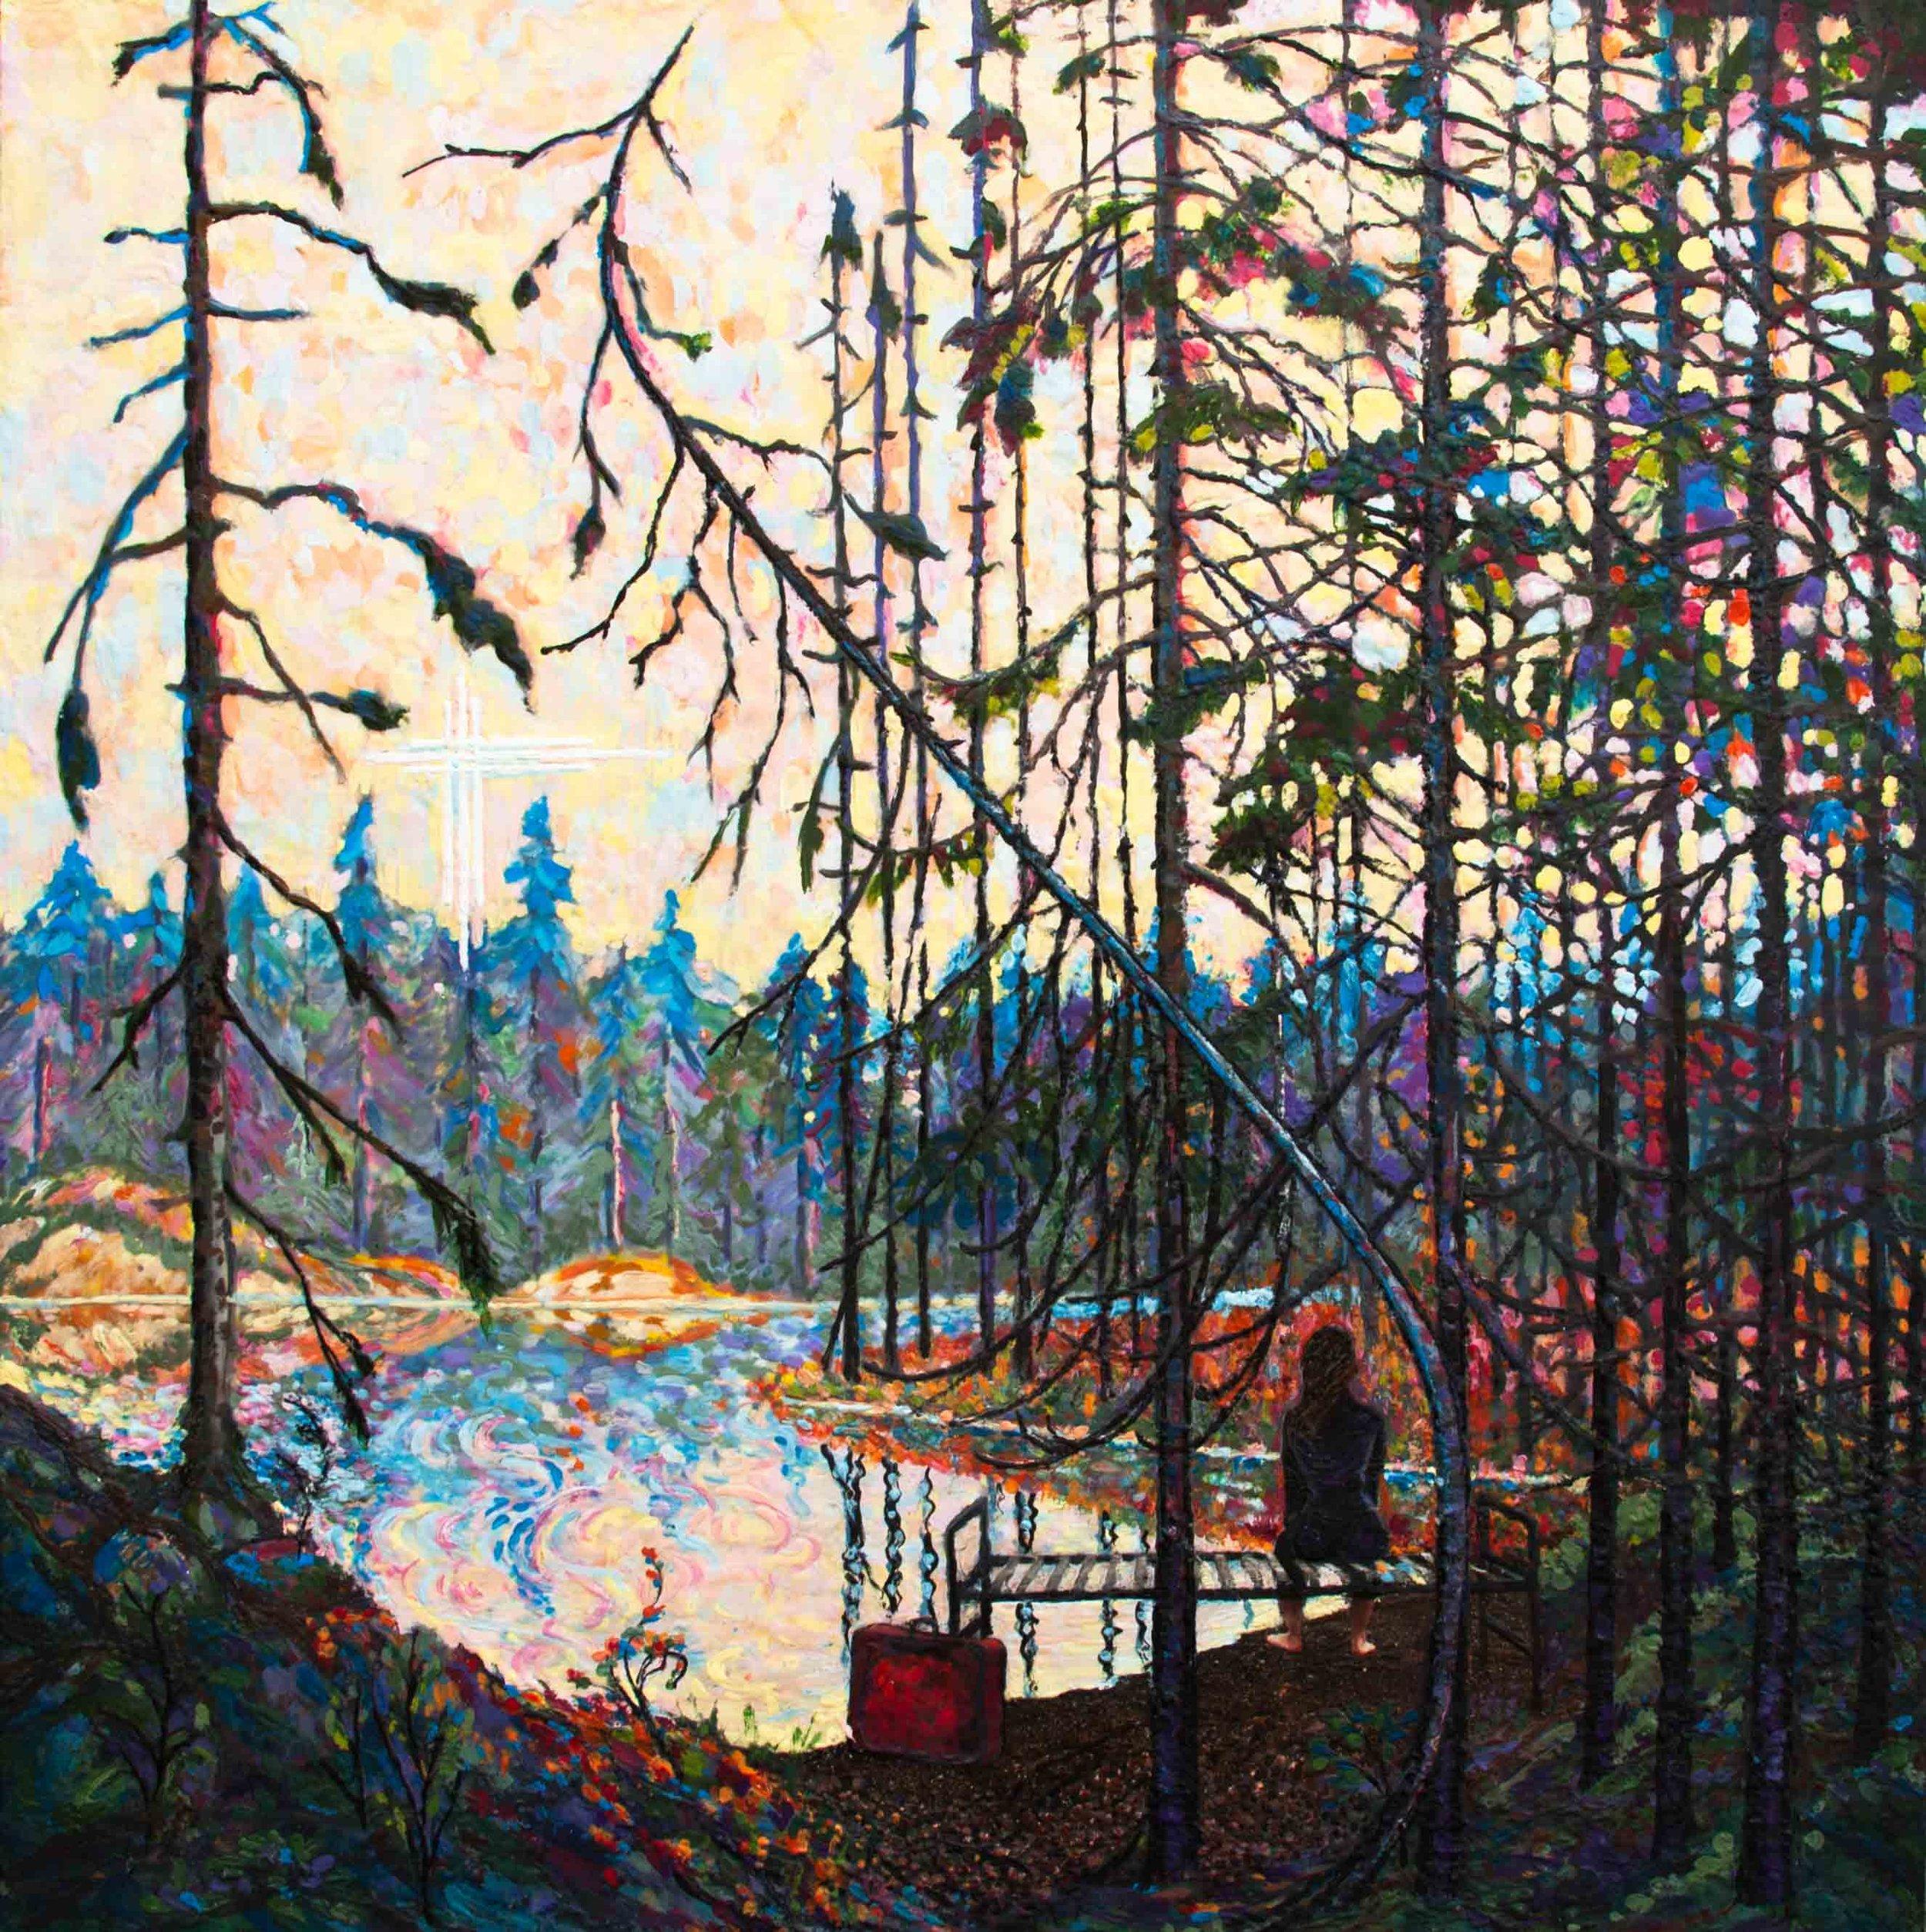 Tom's Swamp ,  Amanta Scott , encaustic on birch panel, 30 x 30 x 1.75, 2018